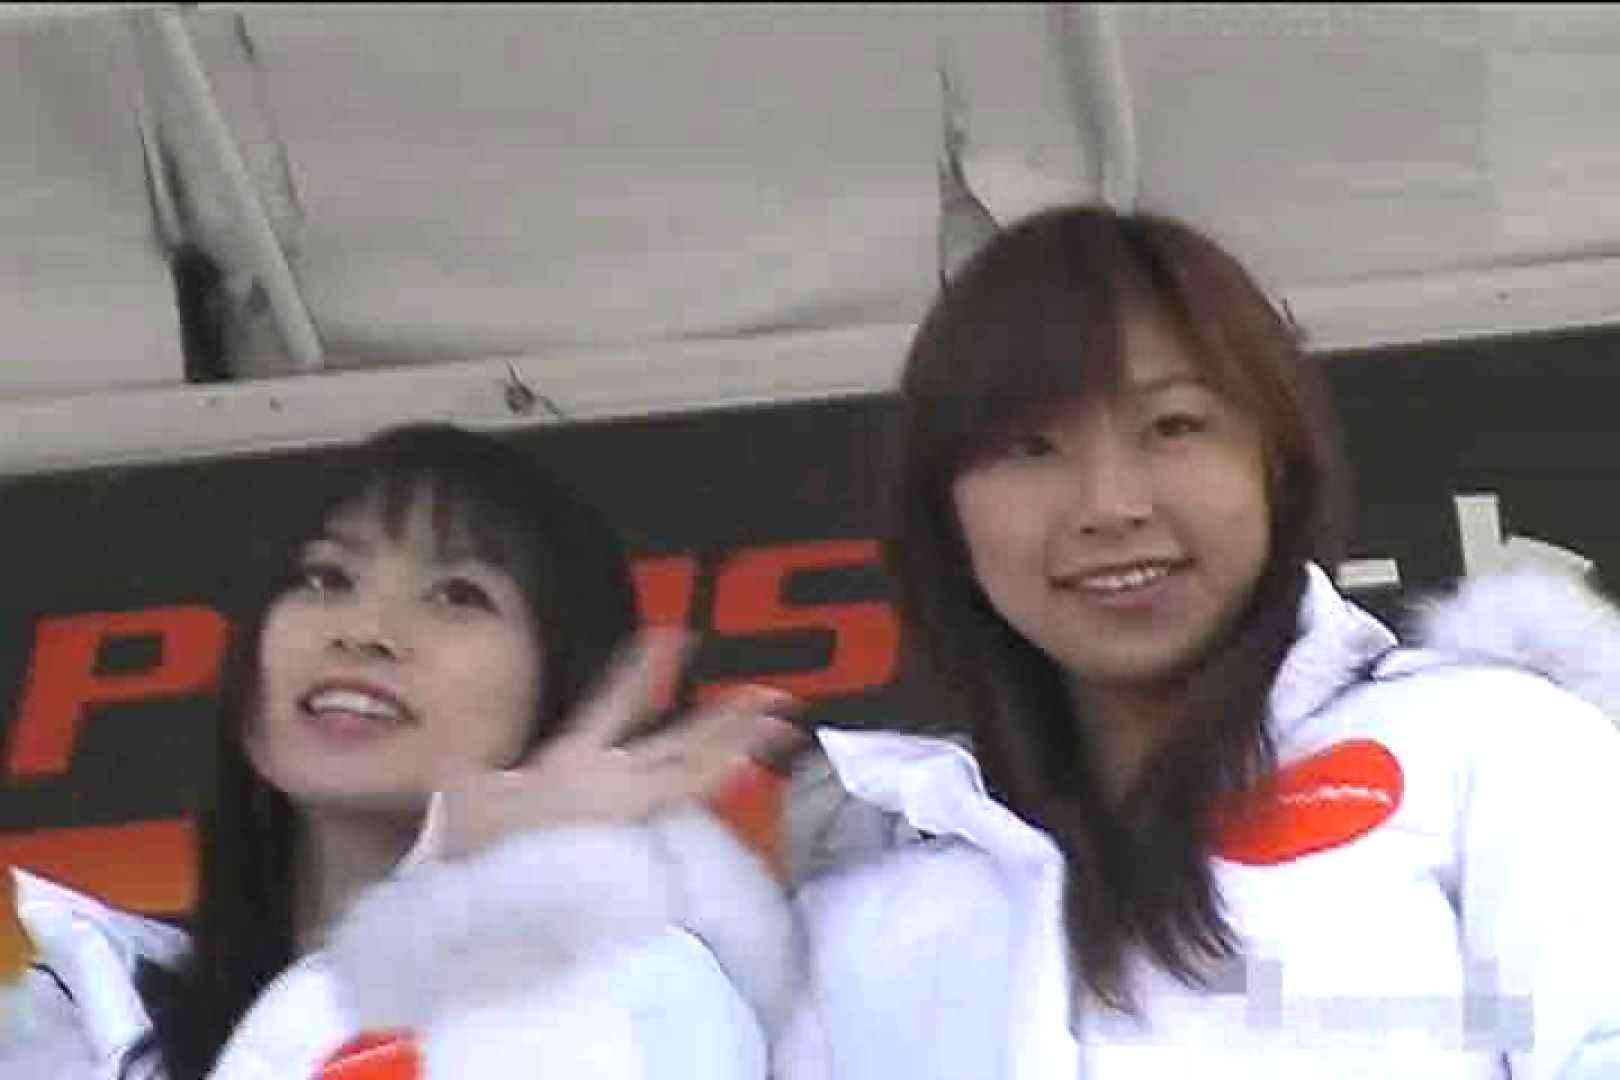 RQカメラ地獄Vol.14 レースクイーン スケベ動画紹介 89pic 59